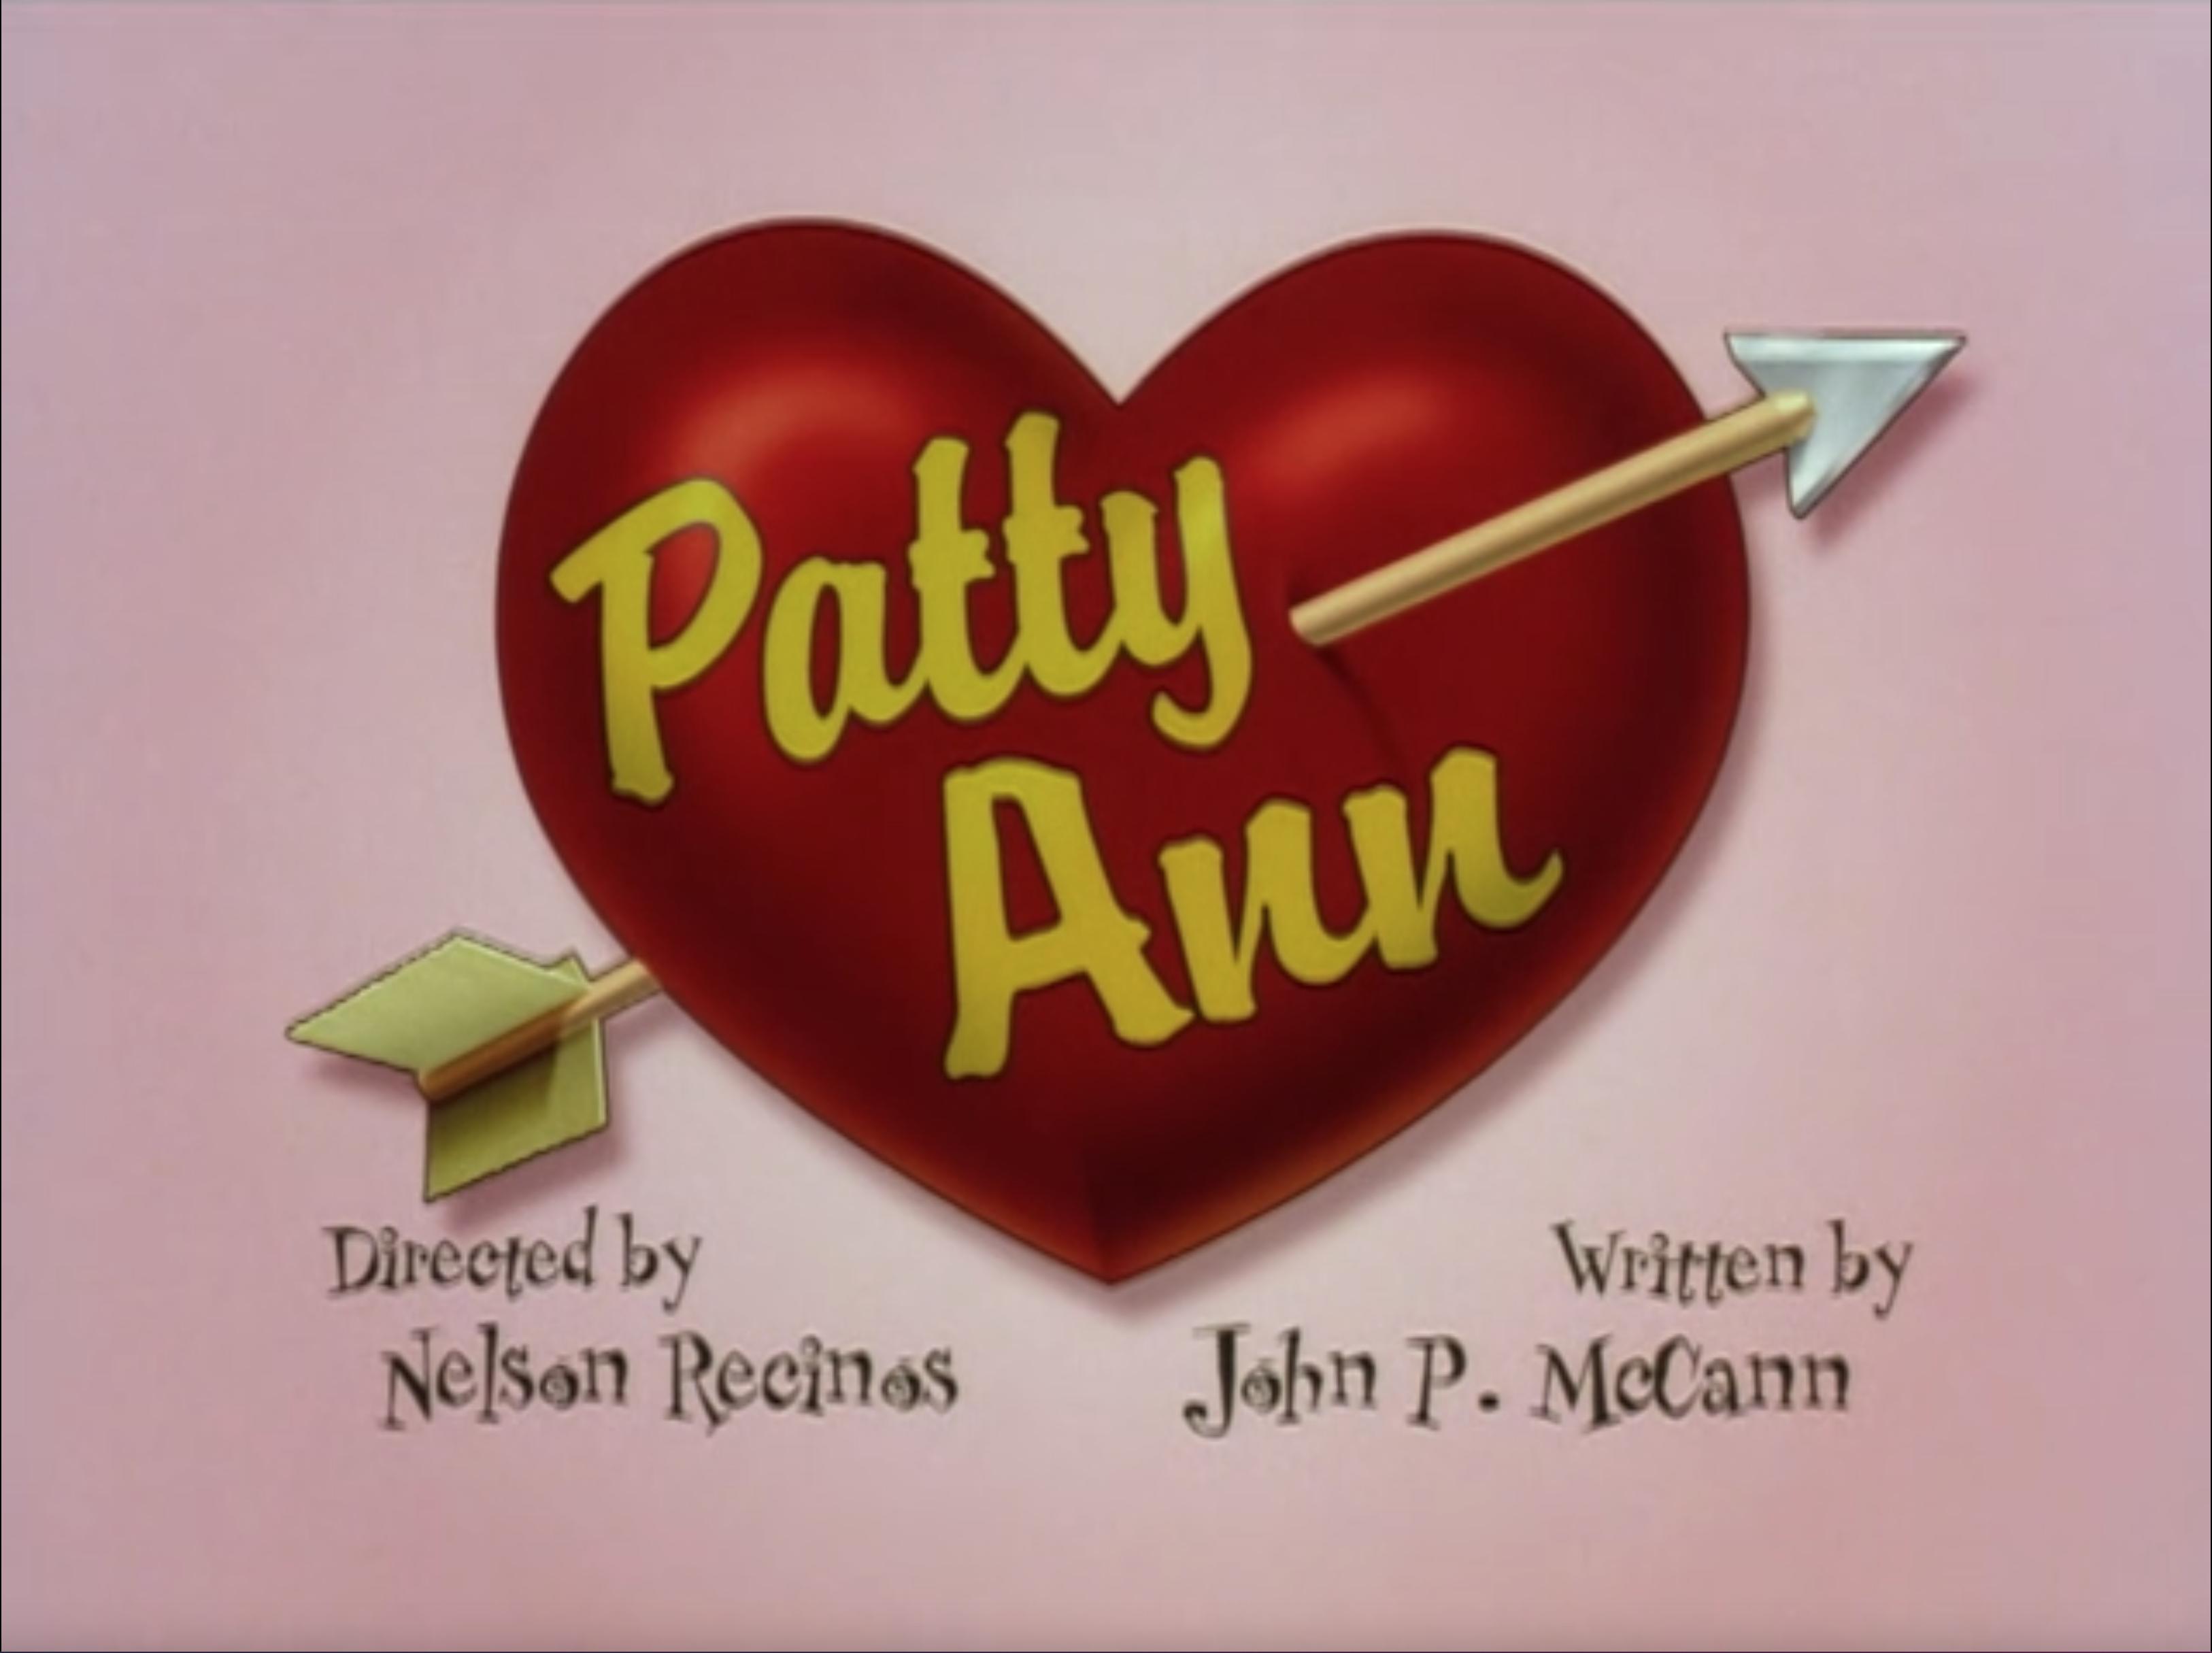 File:Patty Ann Title Card.png